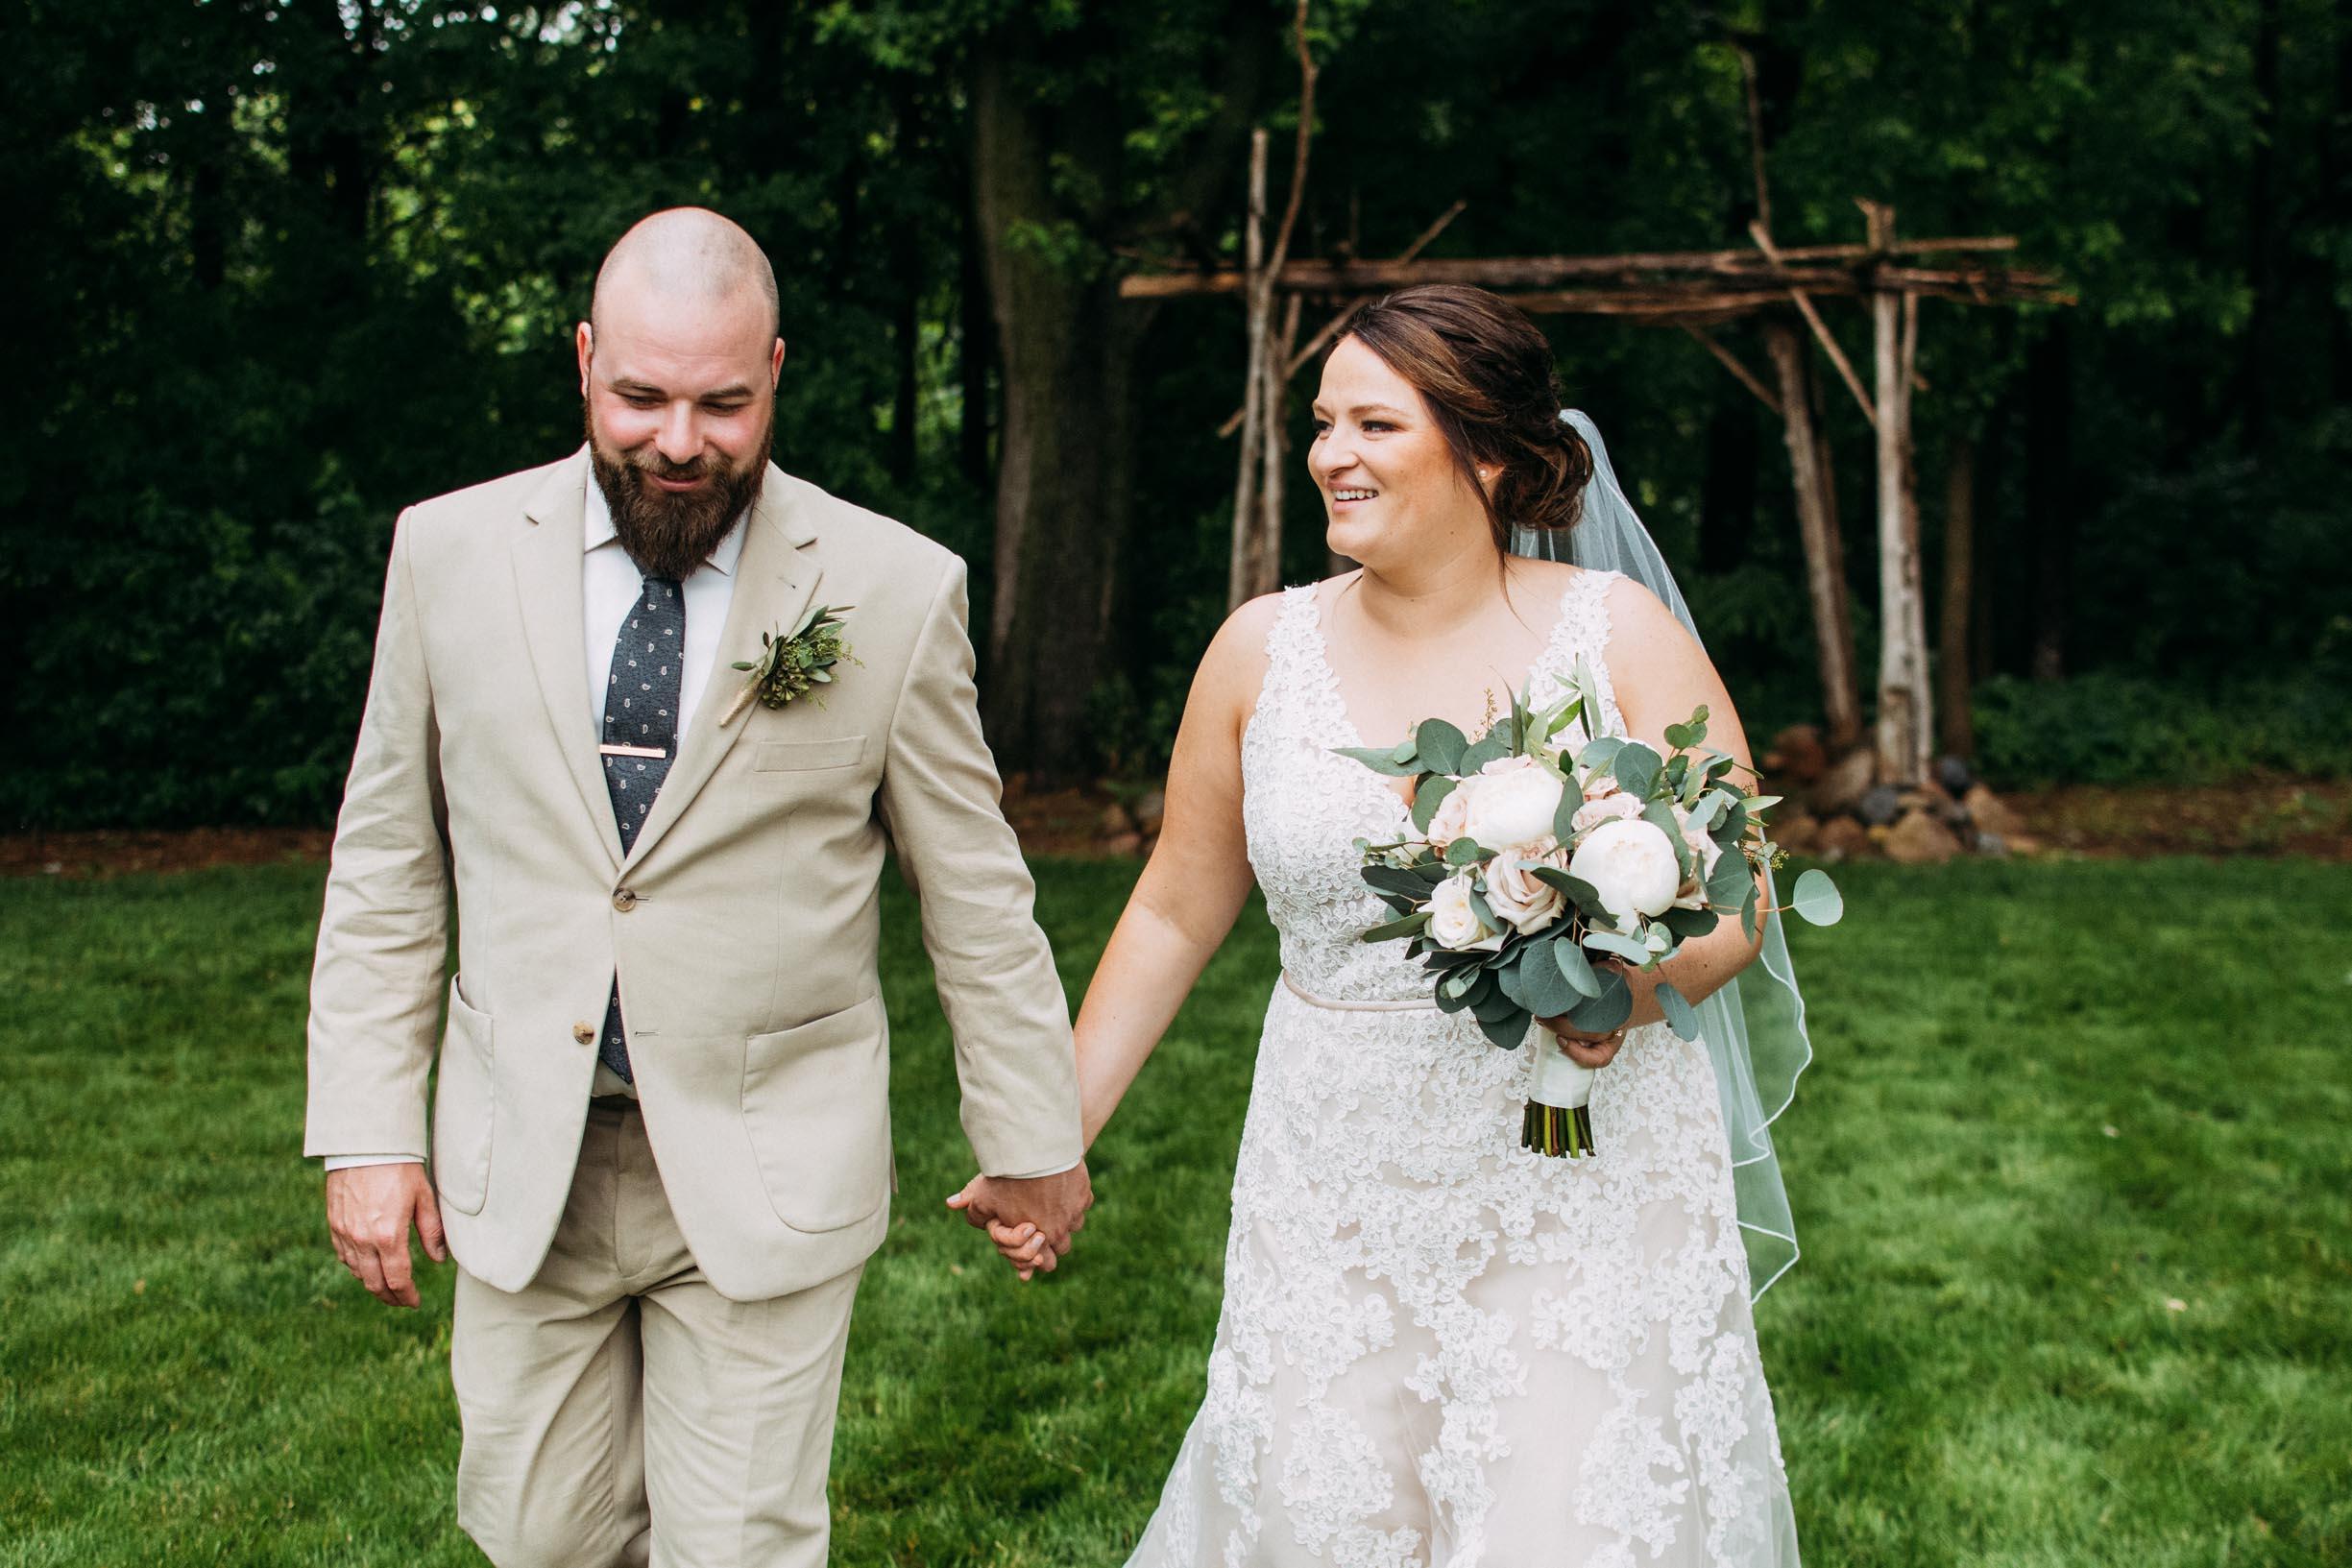 29-Jess_Jeremy_Minnesota_Wedding.jpg